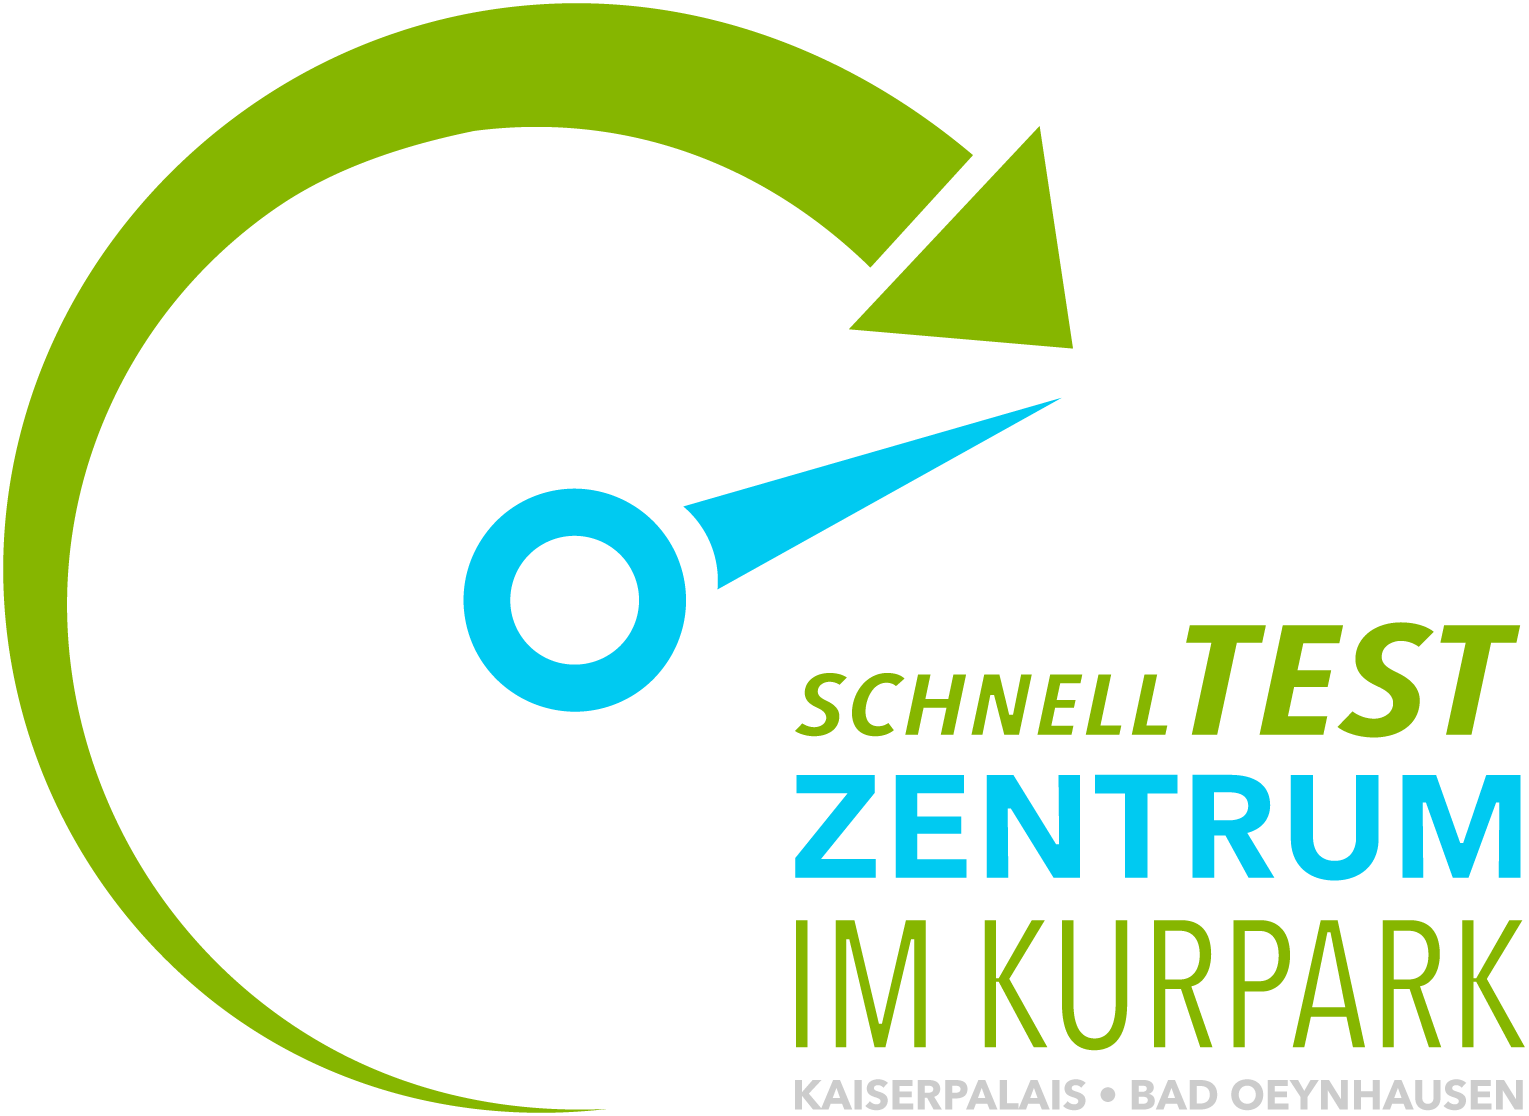 Corona Schnelltest Zentrum Bad Oeynhausen Kurpark Kaiserpalais